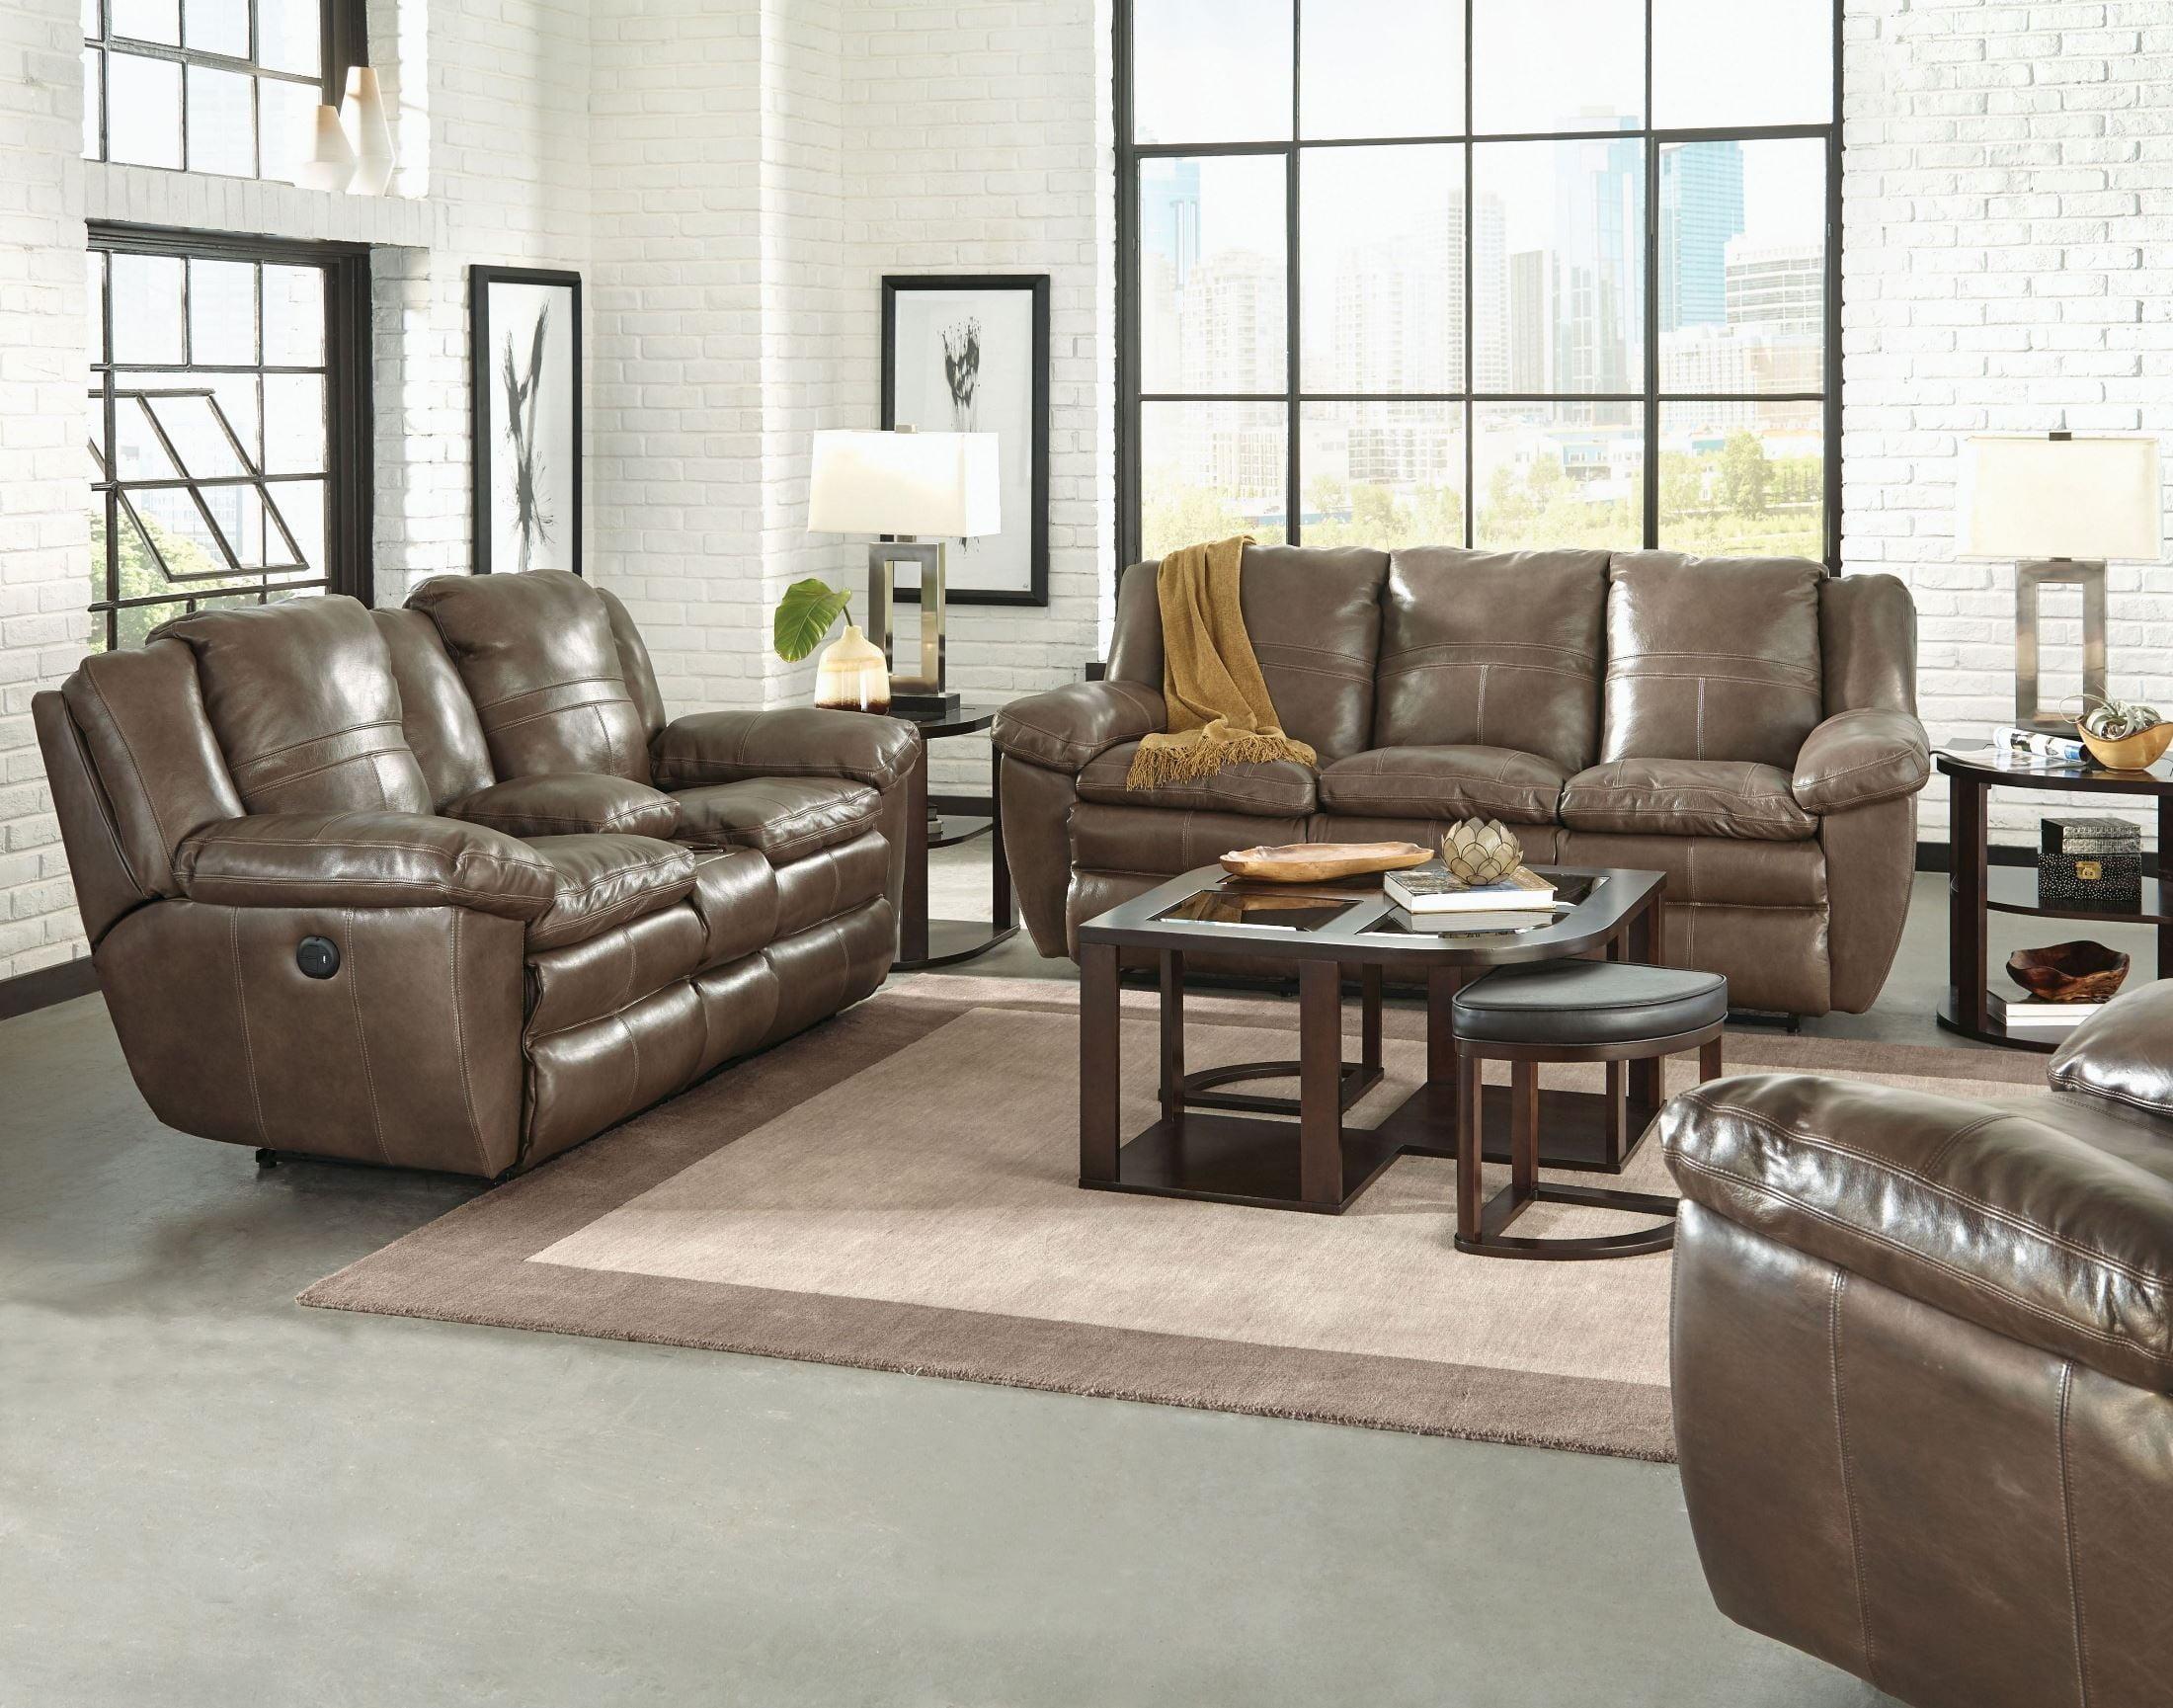 Aria Smoke Power Lay Flat Reclining Sofa 64191 1283 18 3083 18  ~ Lay Flat Reclining Sofa